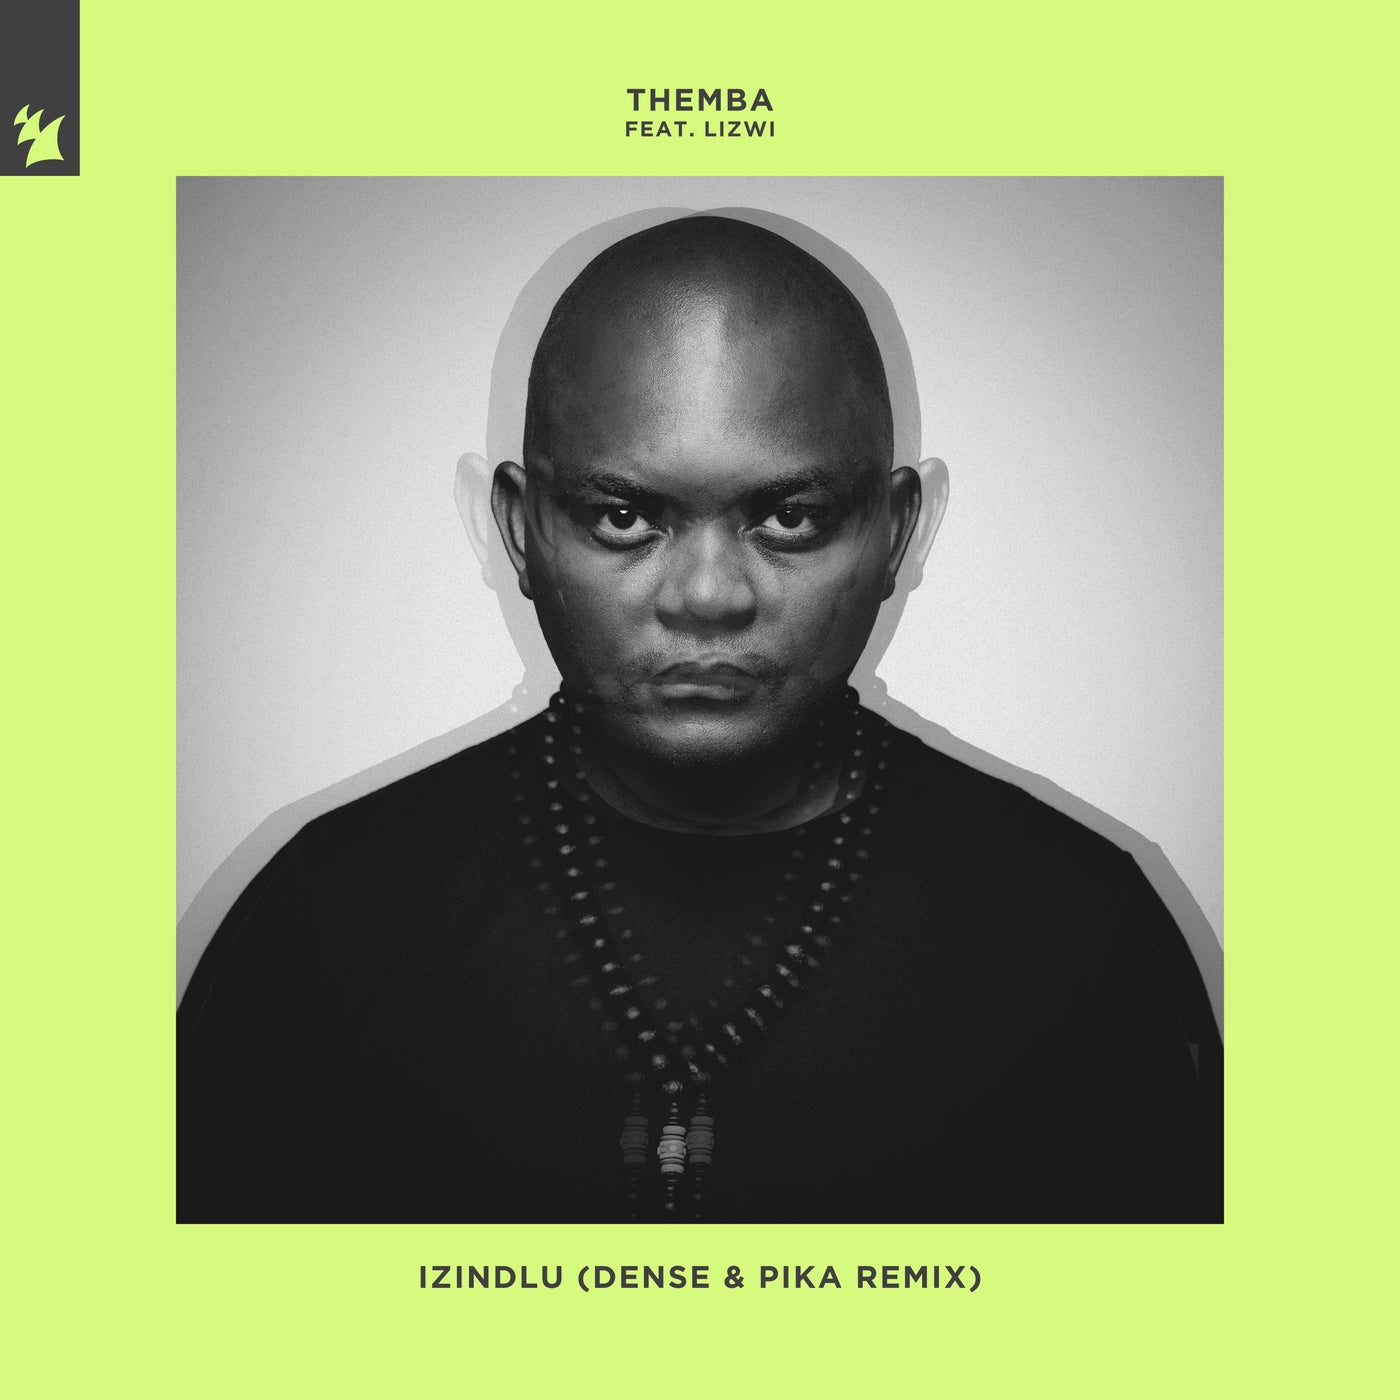 Izindlu feat. Lizwi (Dense & Pika Extended Remix)